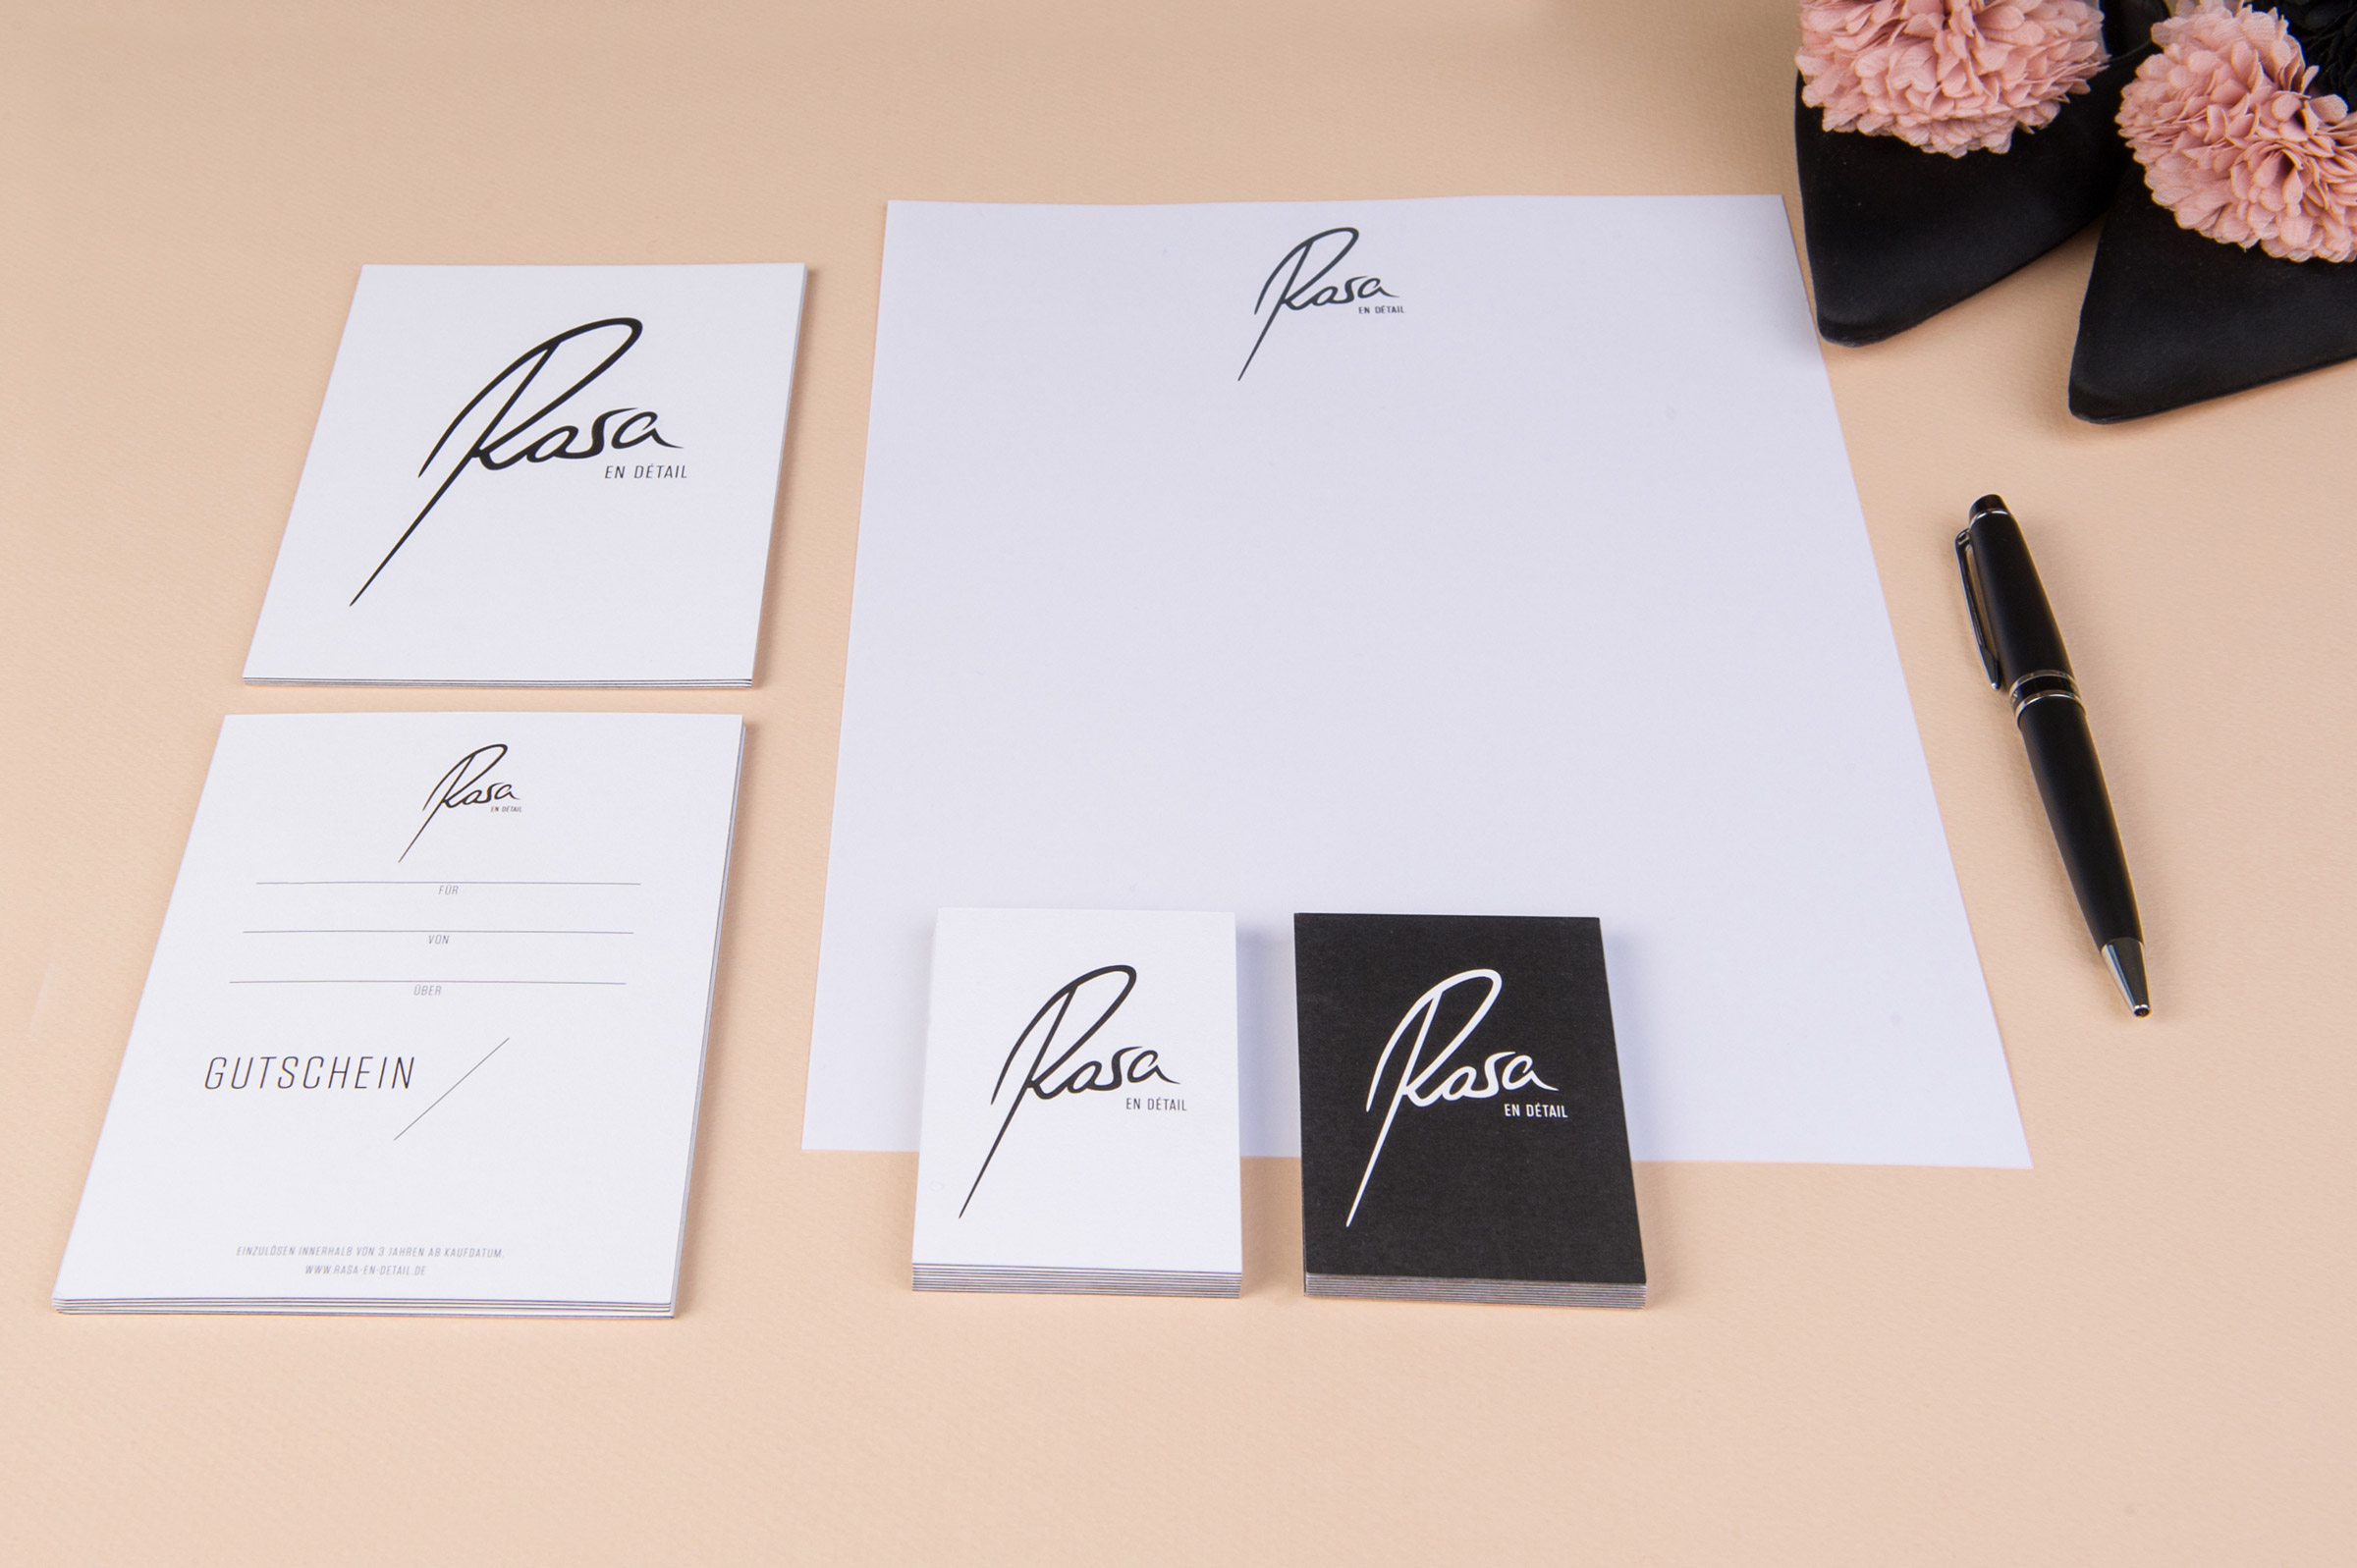 Rasa, Corporate Design, Geschäftsausstattung, Manolo Blahnik